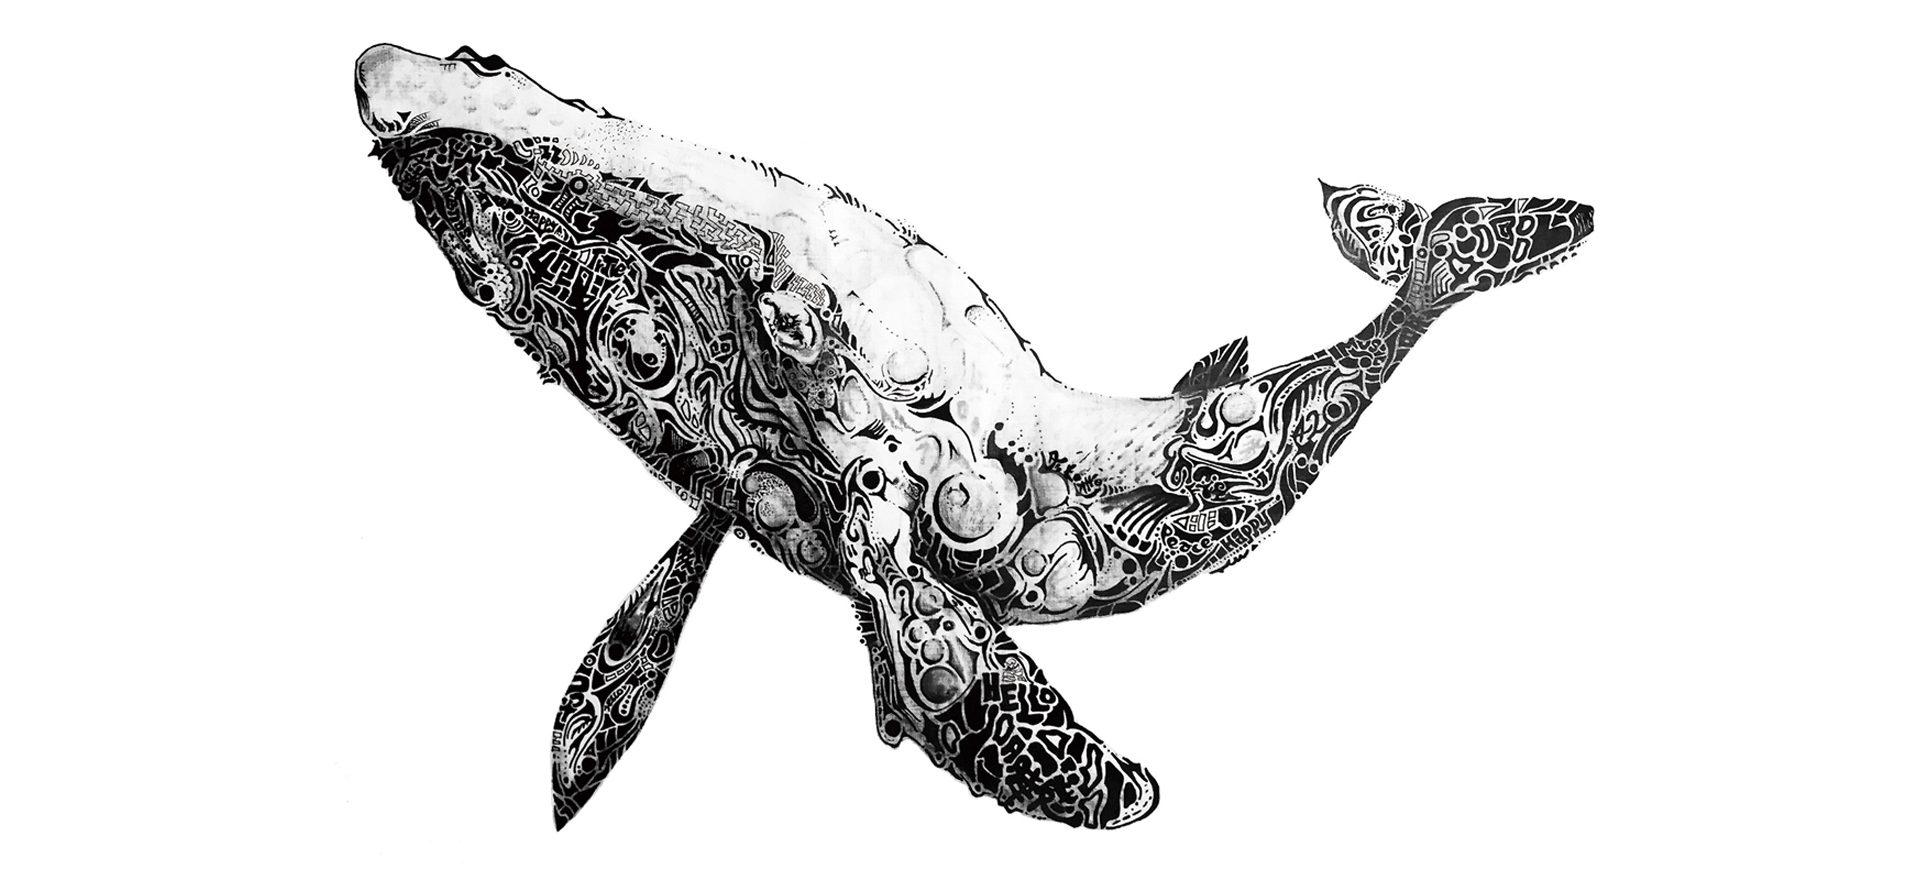 Sightrip(サイトリップ) - RUSOW , ayanicoco , 〼(meL-Hen)